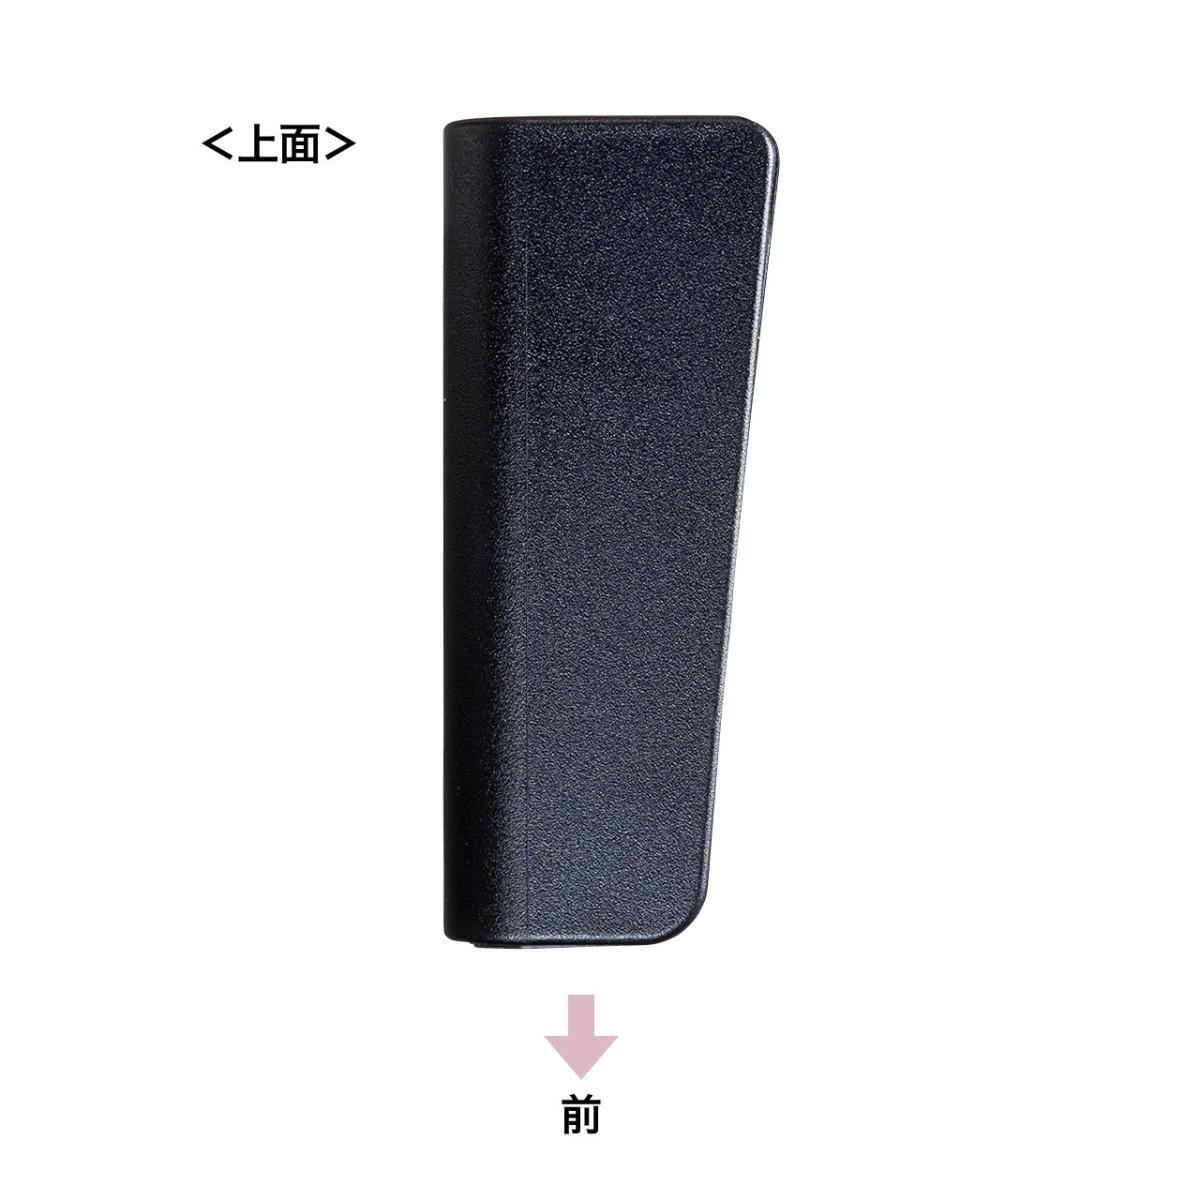 [USB-CVDK7] Type-C・USB3.2A接続デュアルHDMIドッキングステーション